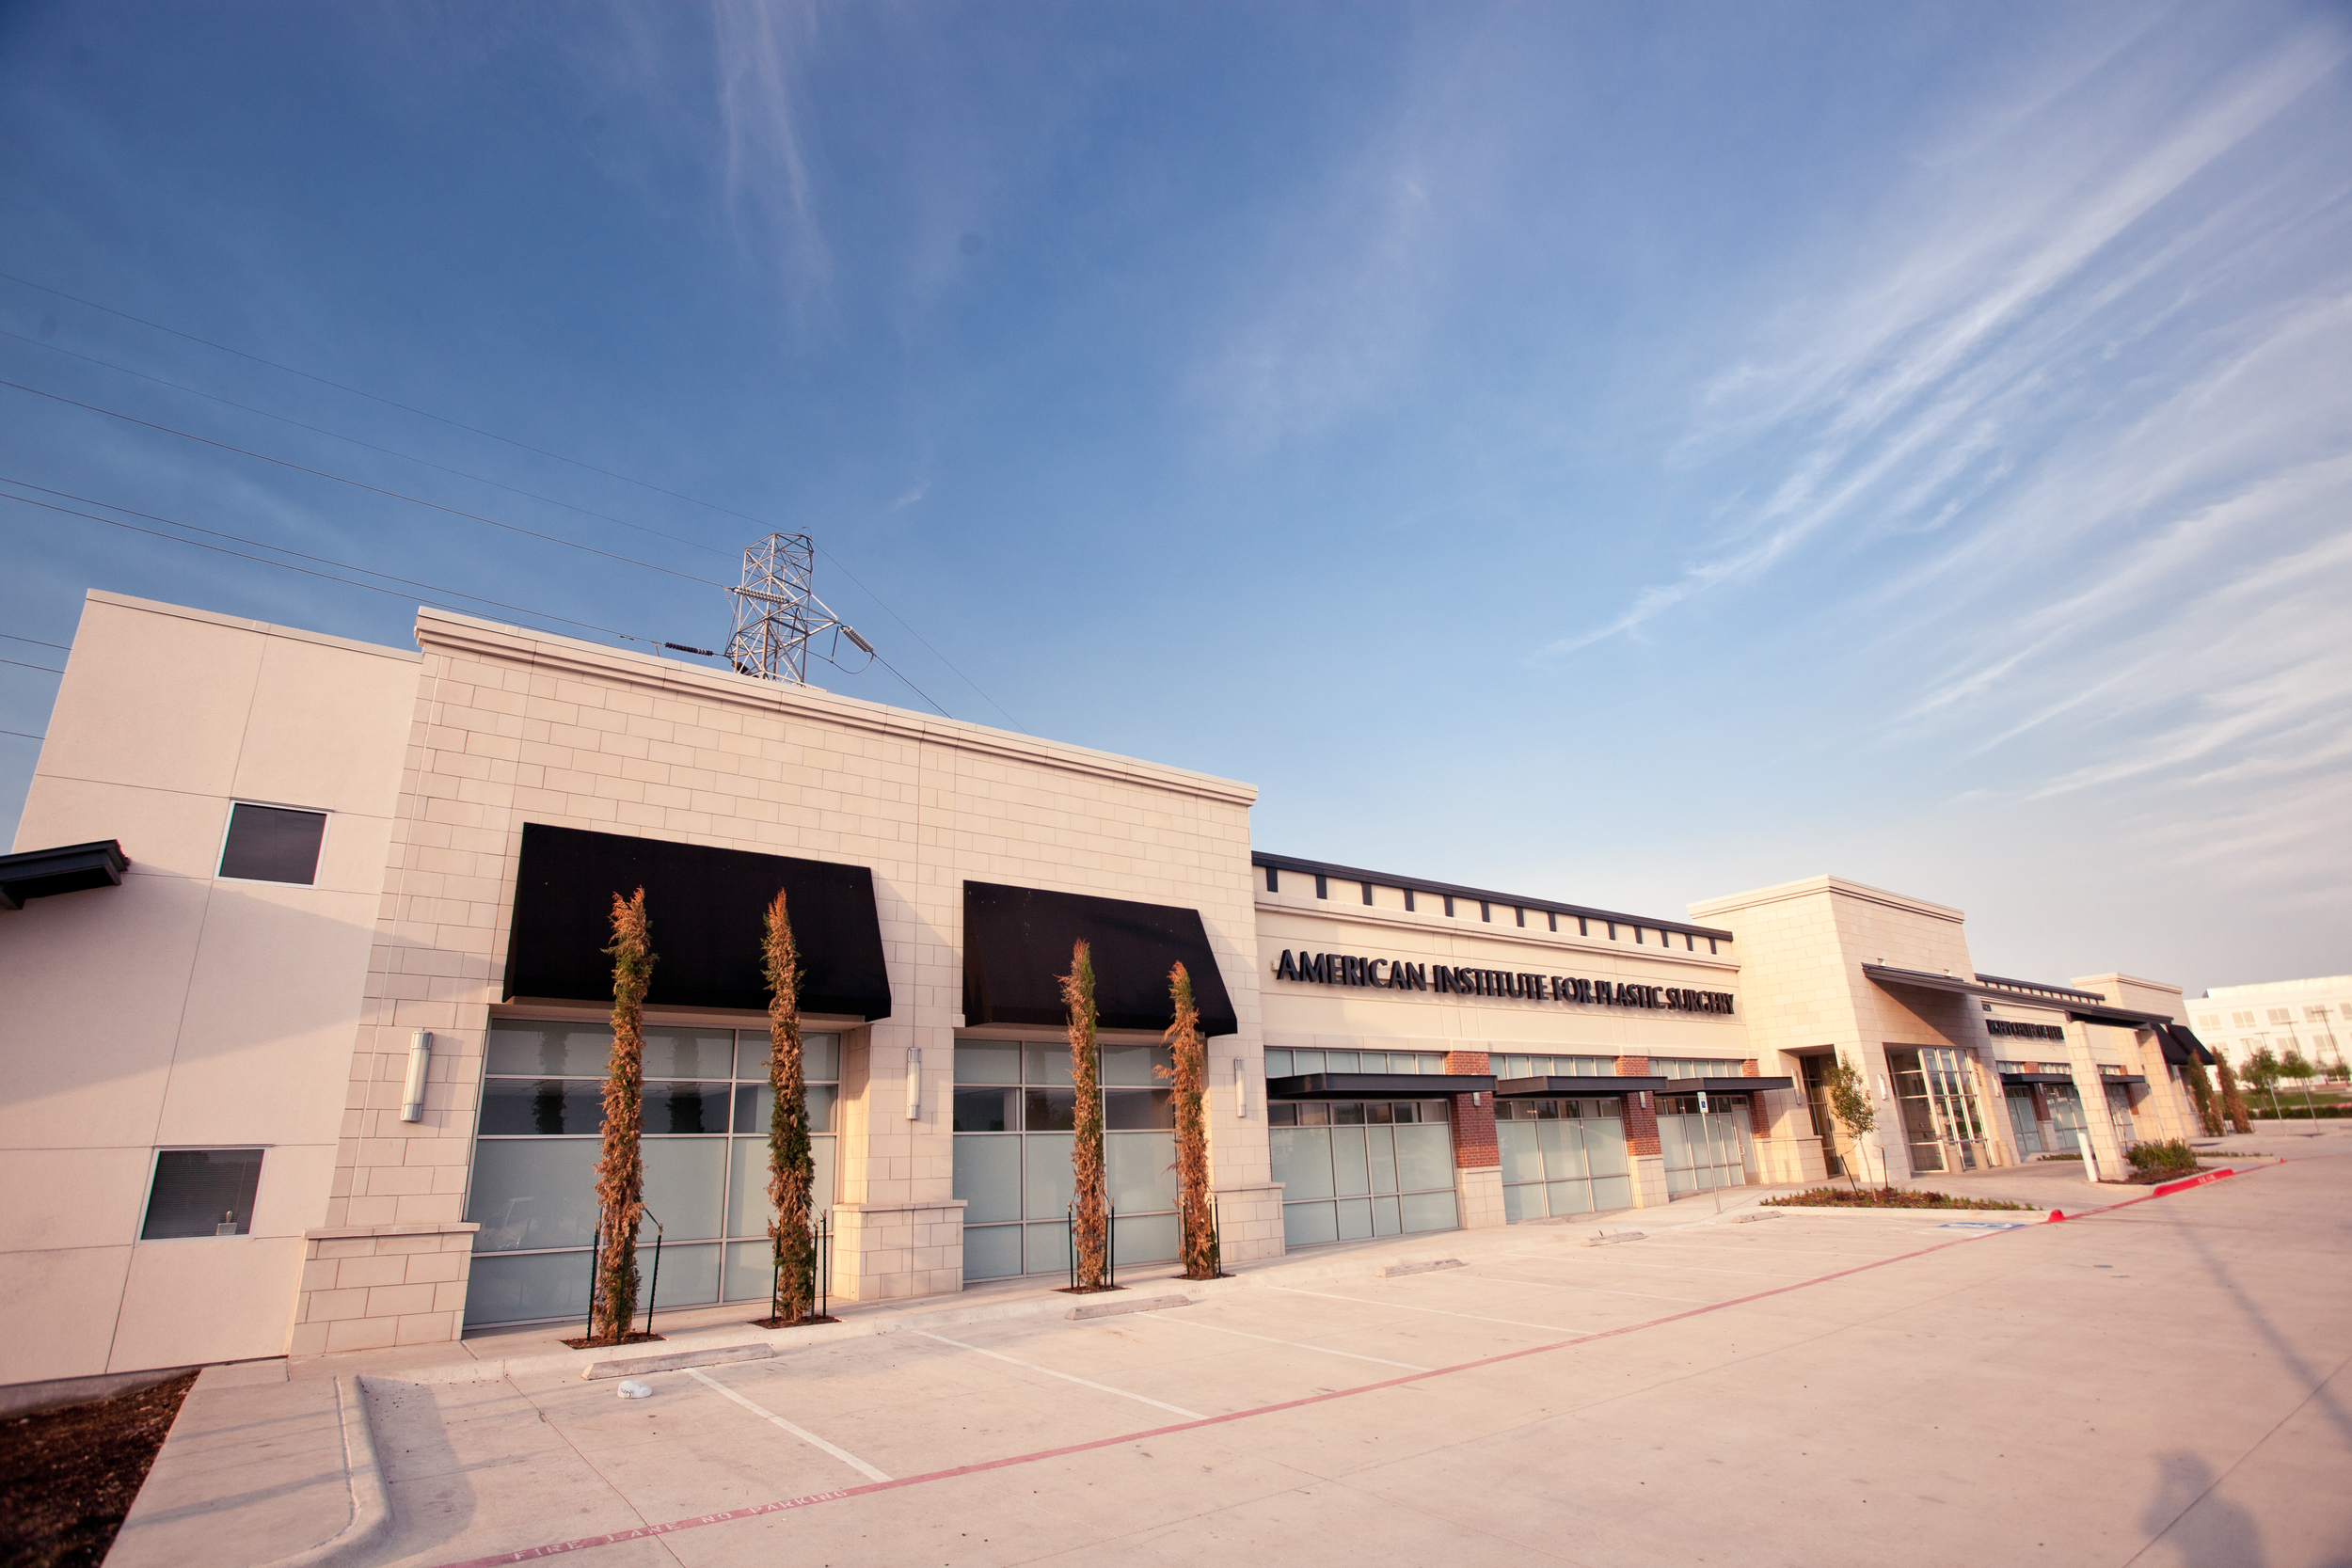 American Institute for Plastic Surgery, Plano, TX